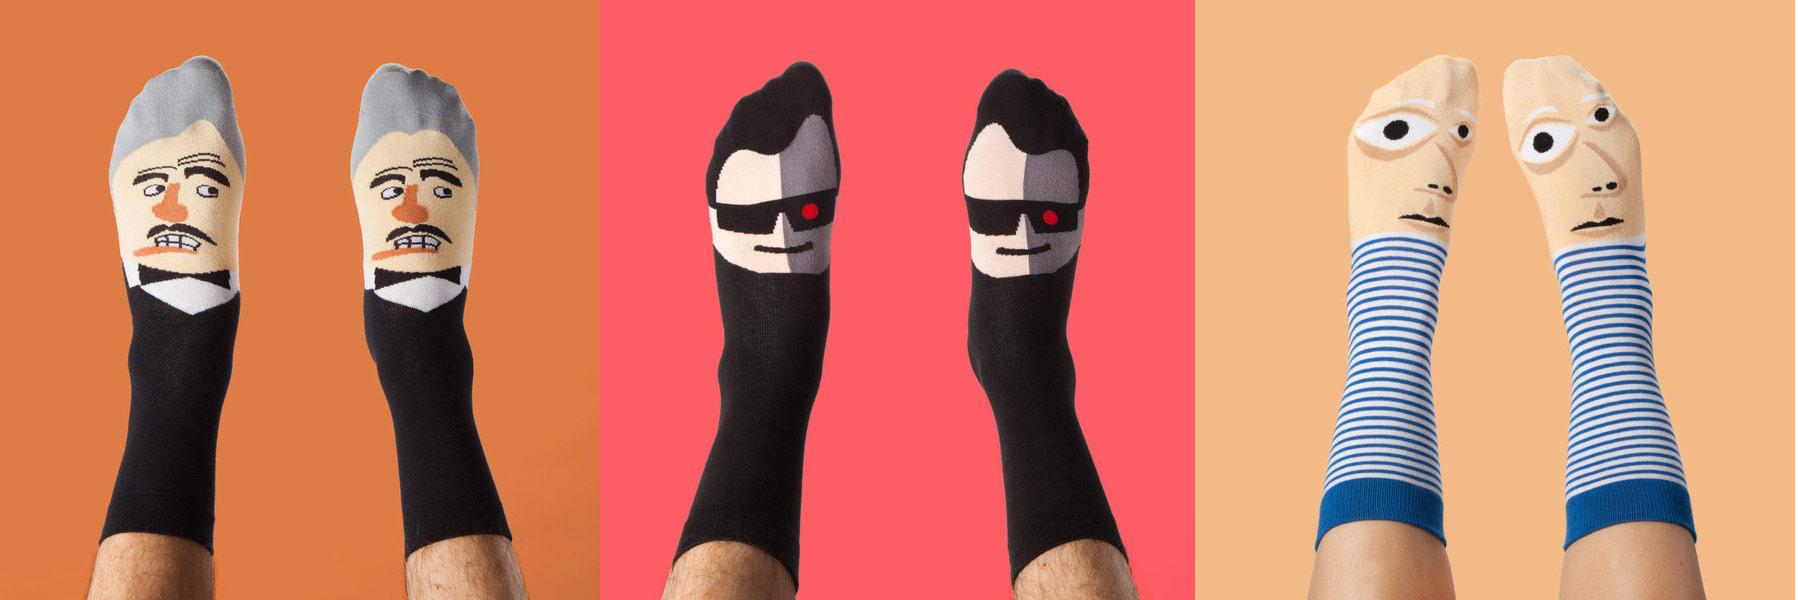 chaussettes_celebrites_home